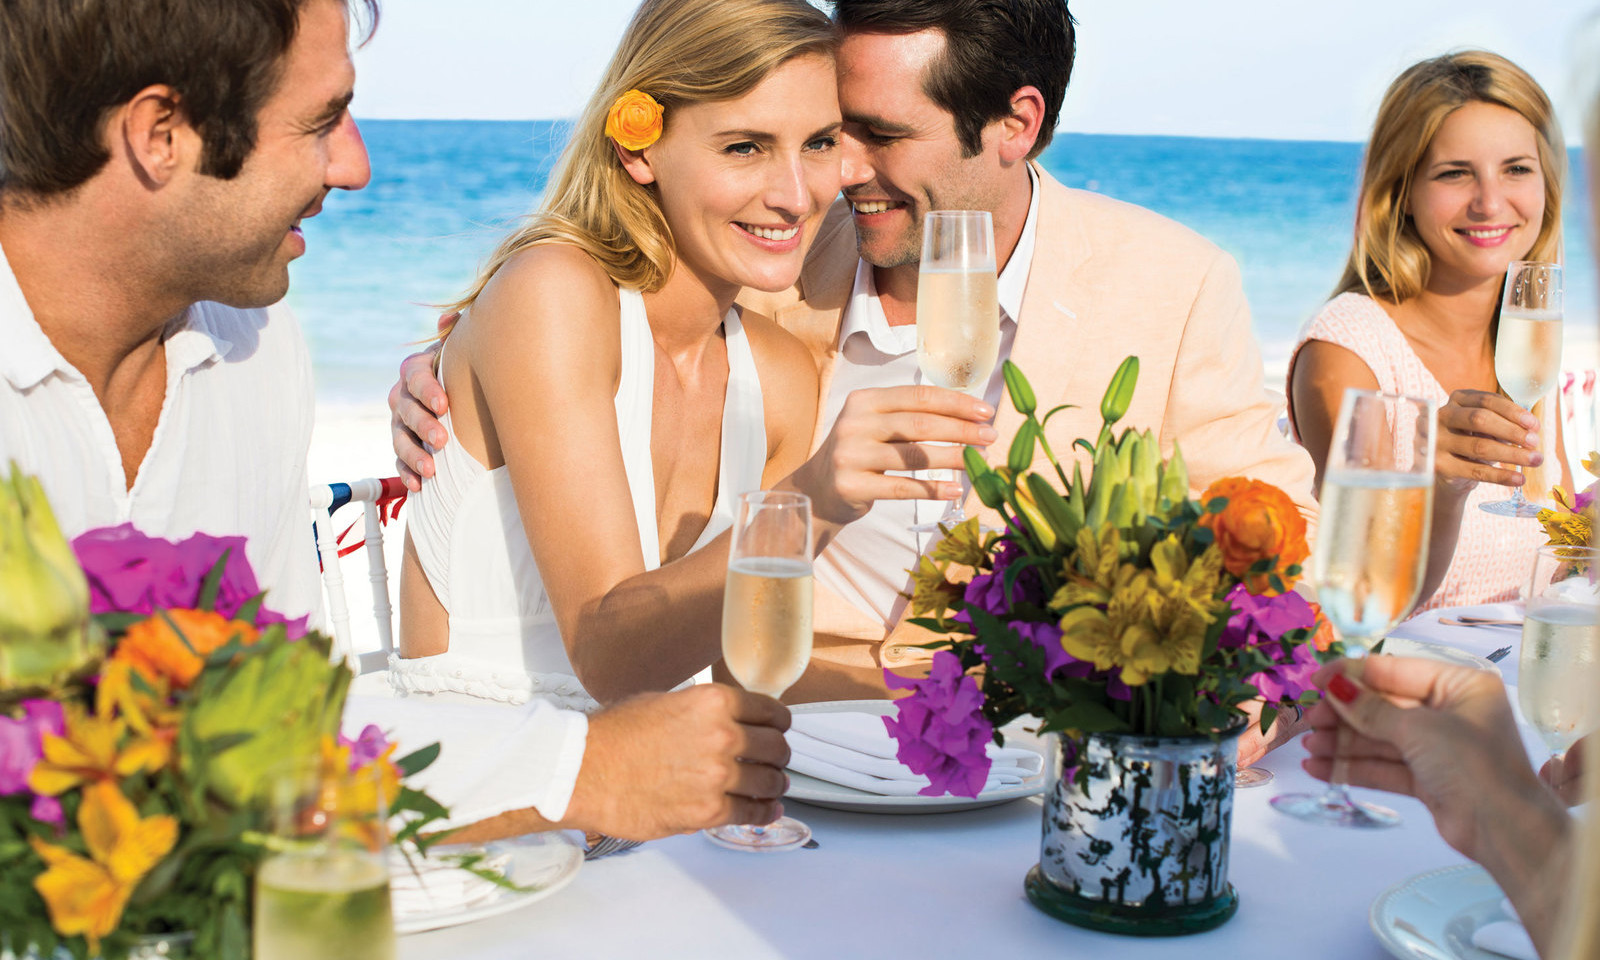 cancun-wedding-resort-celebrate.jpg